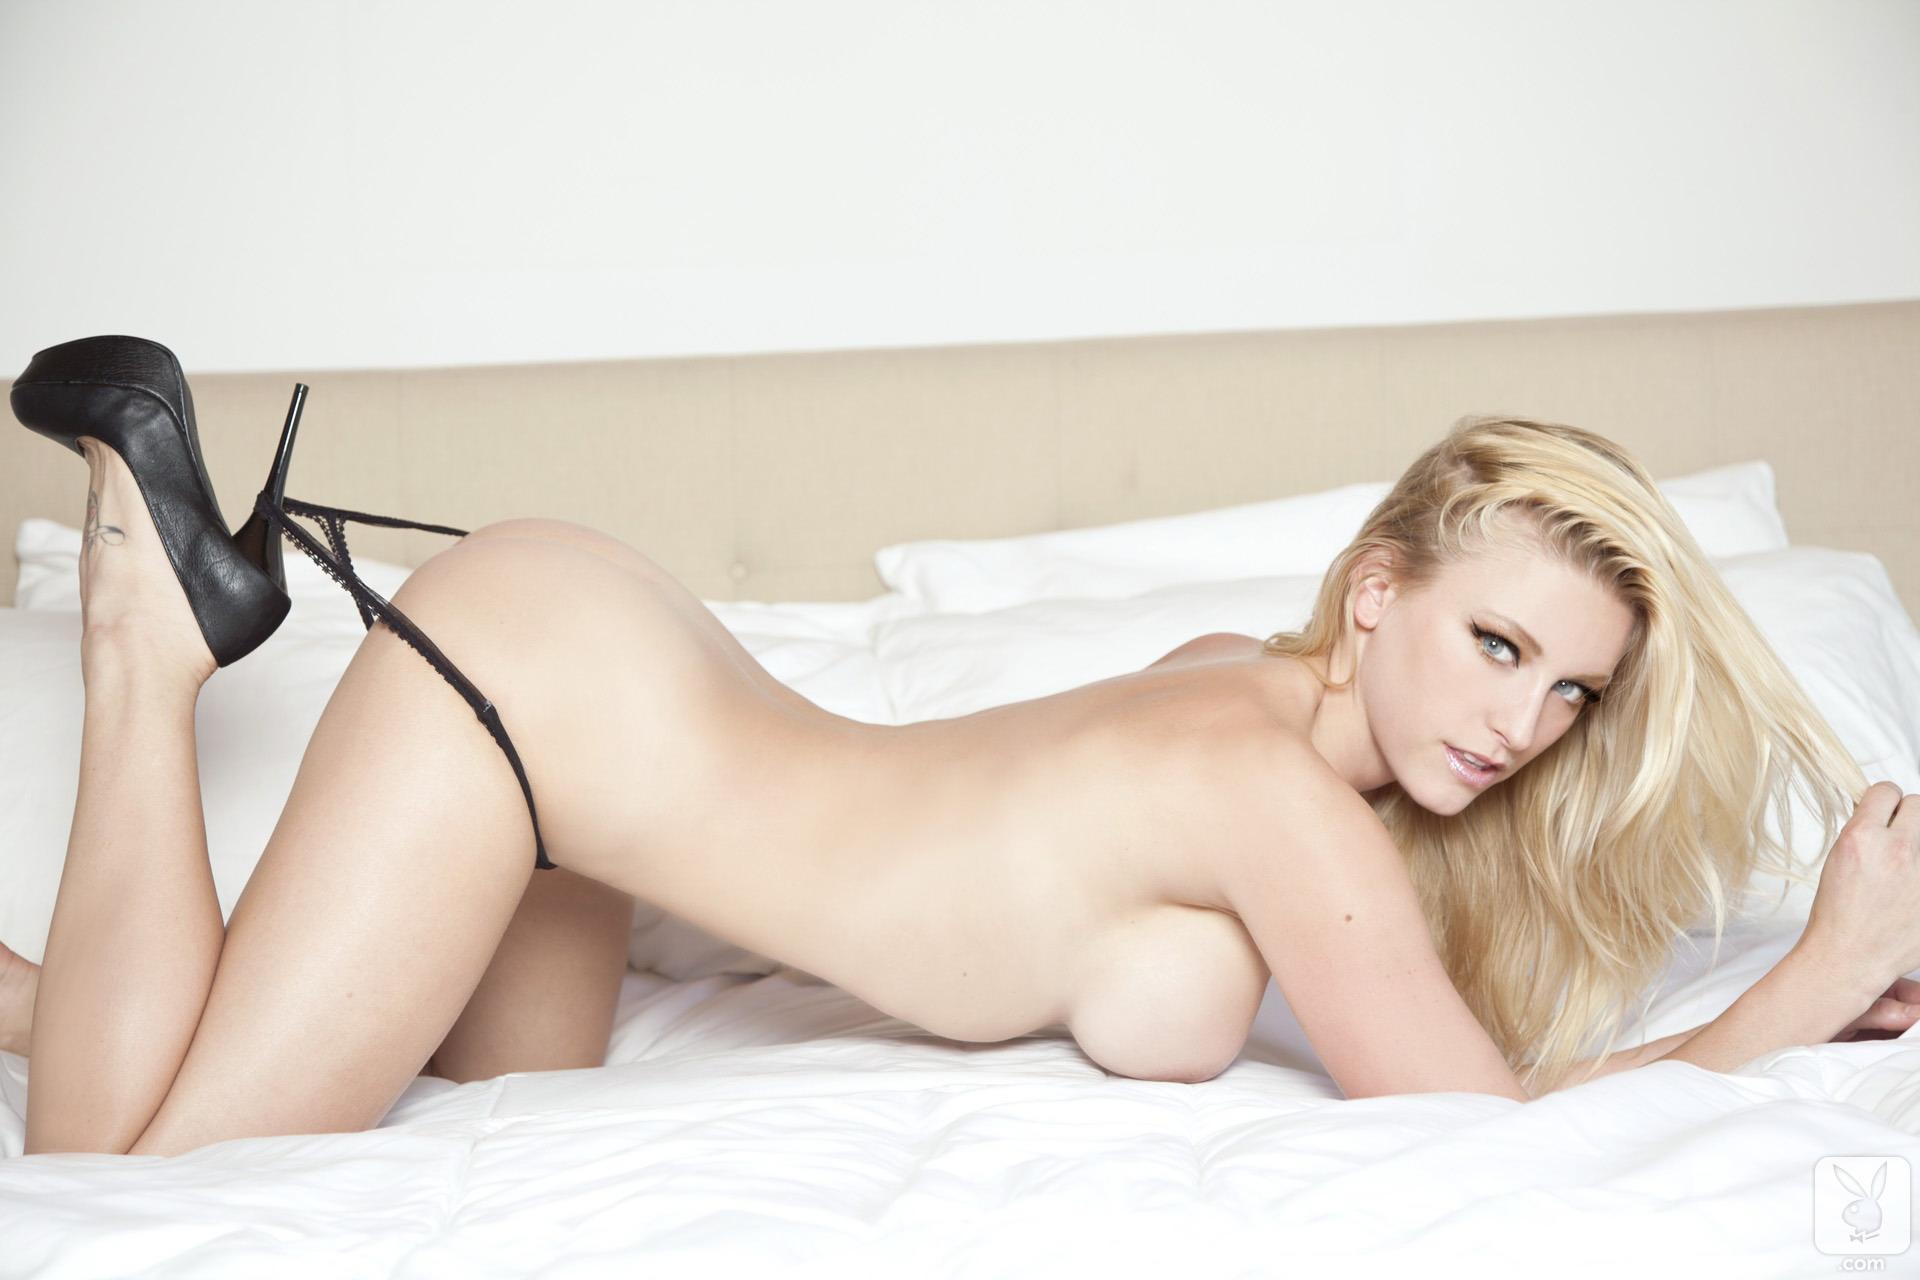 Thai girl porn free online